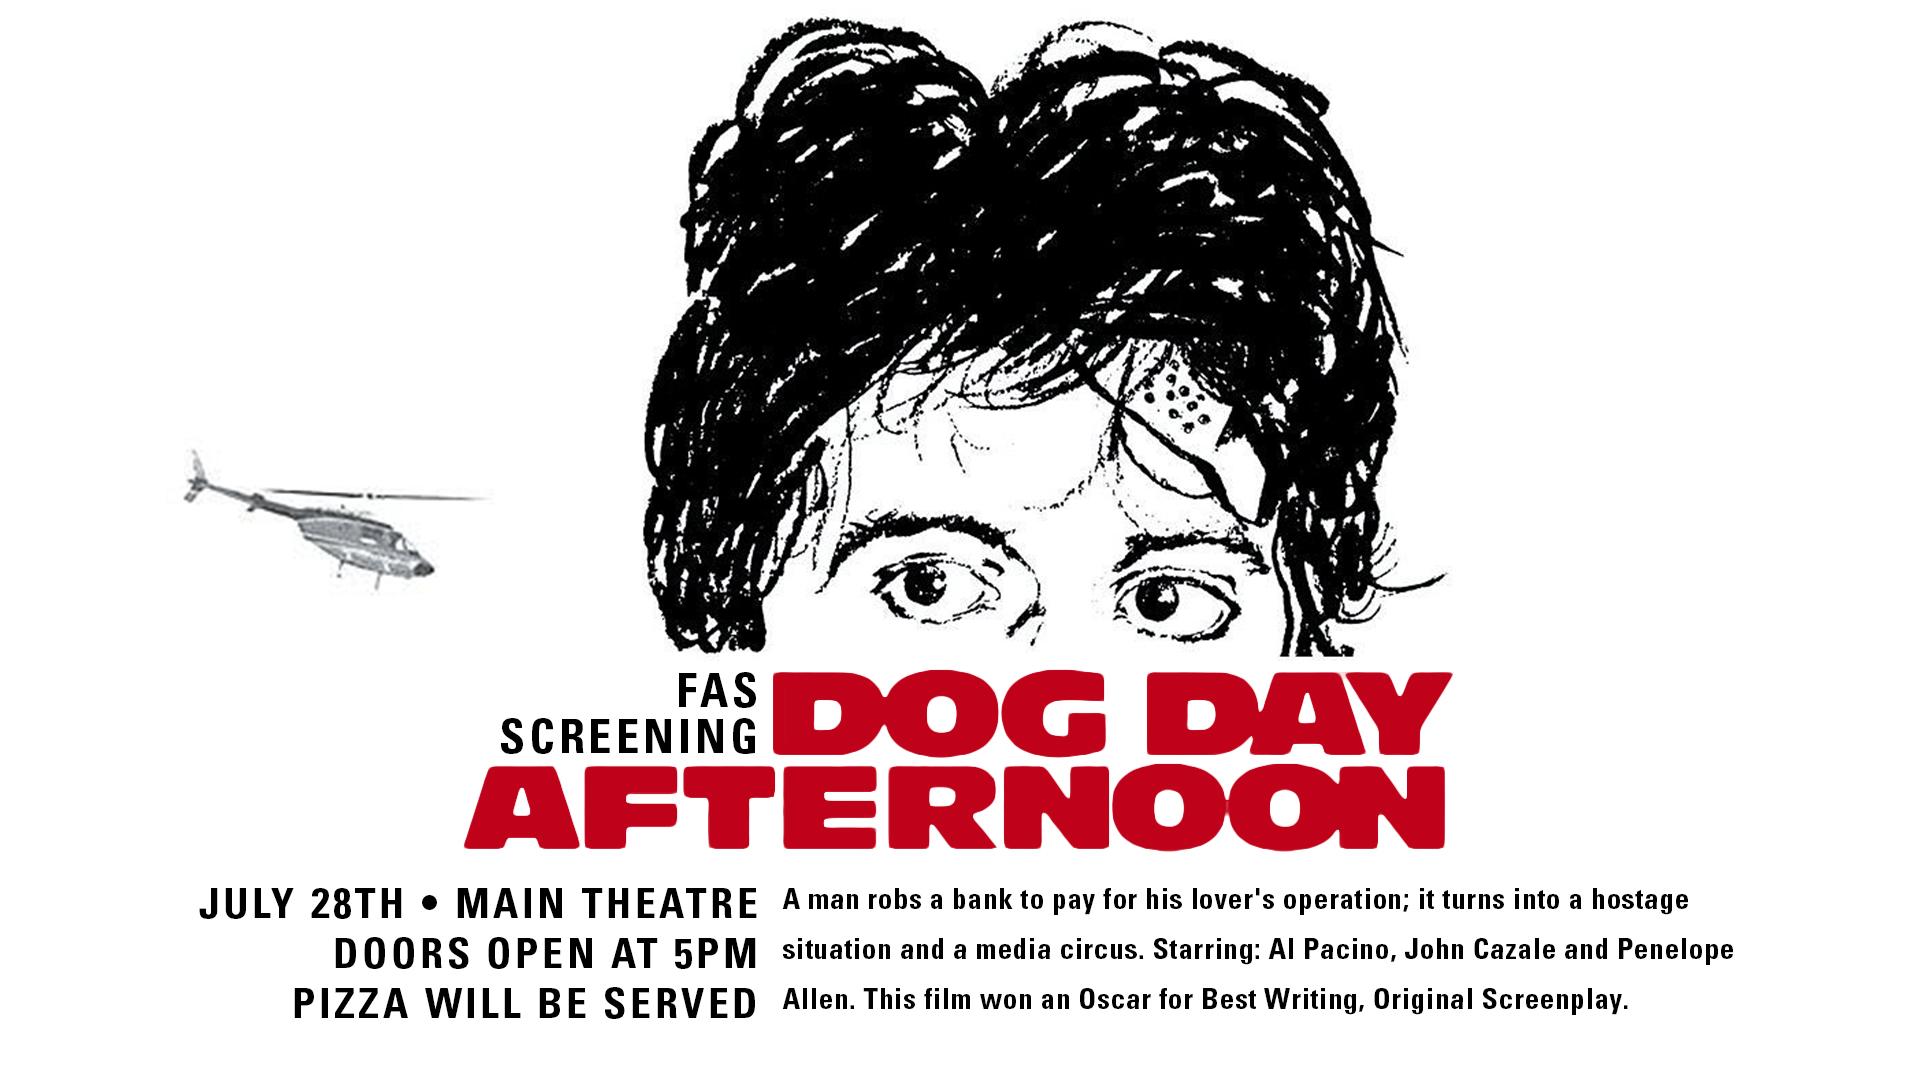 Film Appreciation Society Screening Dog Day Afternoon 1975 1920x1080